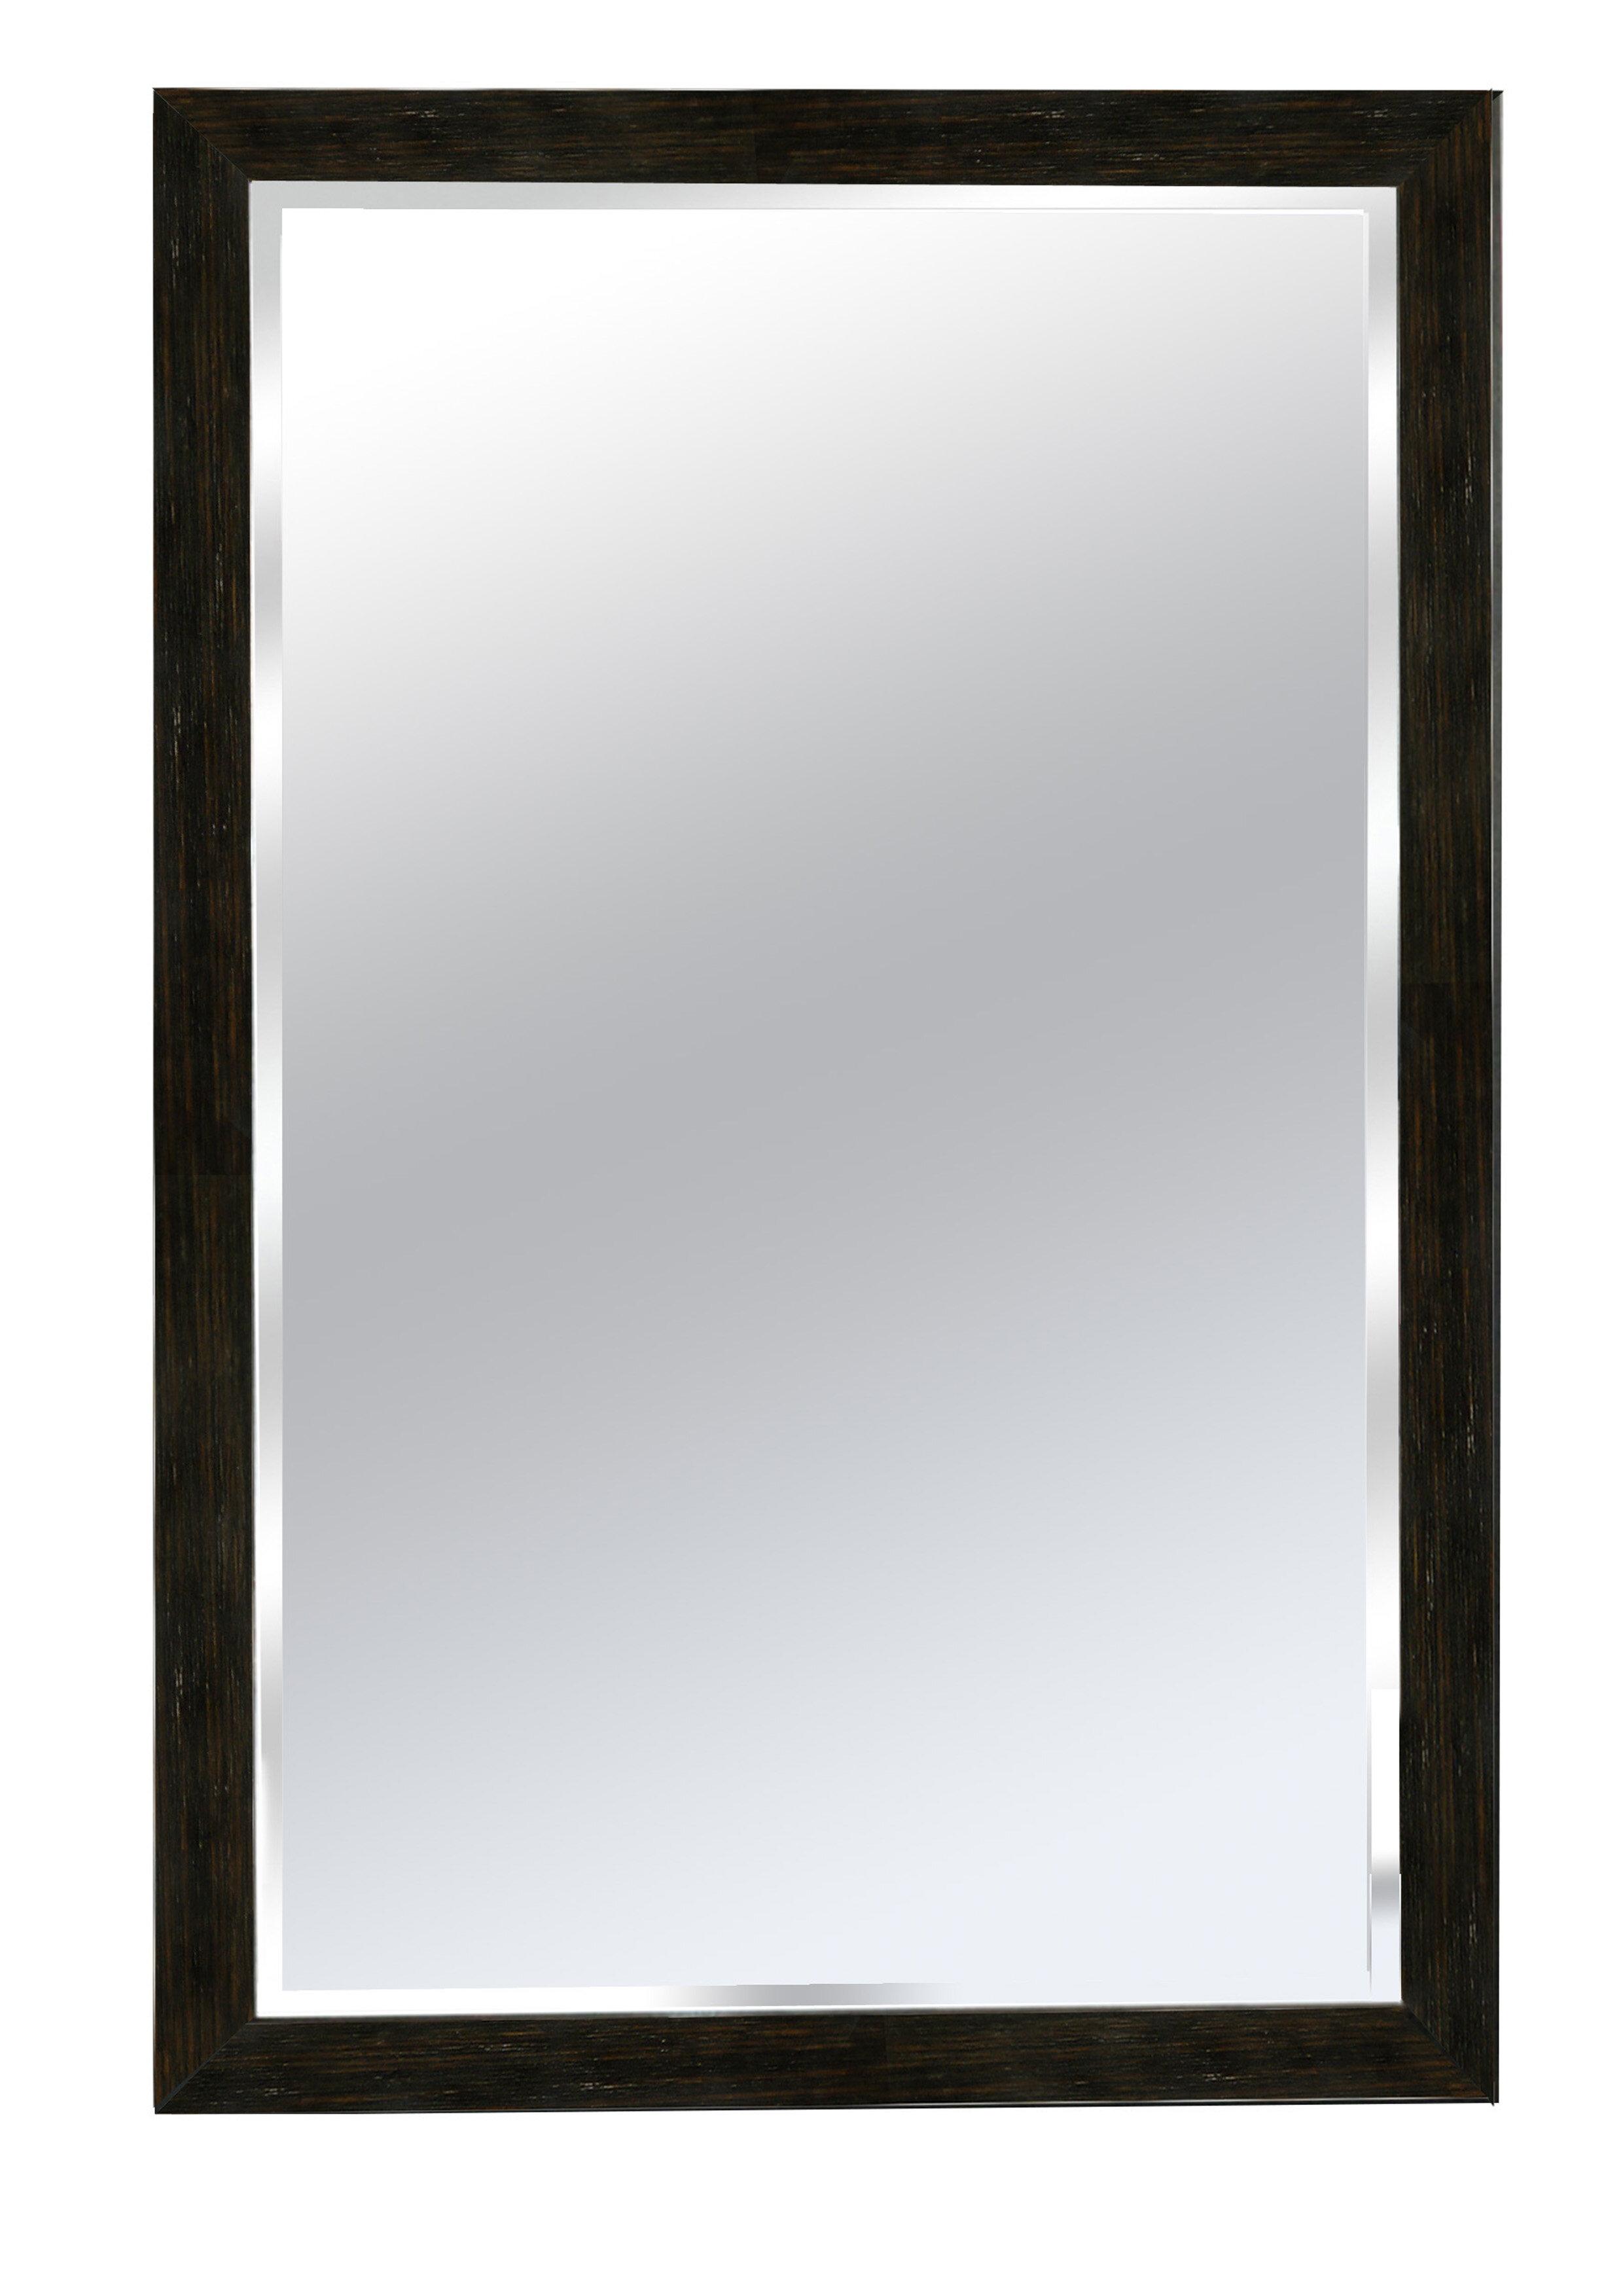 Winston Porter Cocopah Wood Framed Bathroom Wall Mirror Reviews Wayfair